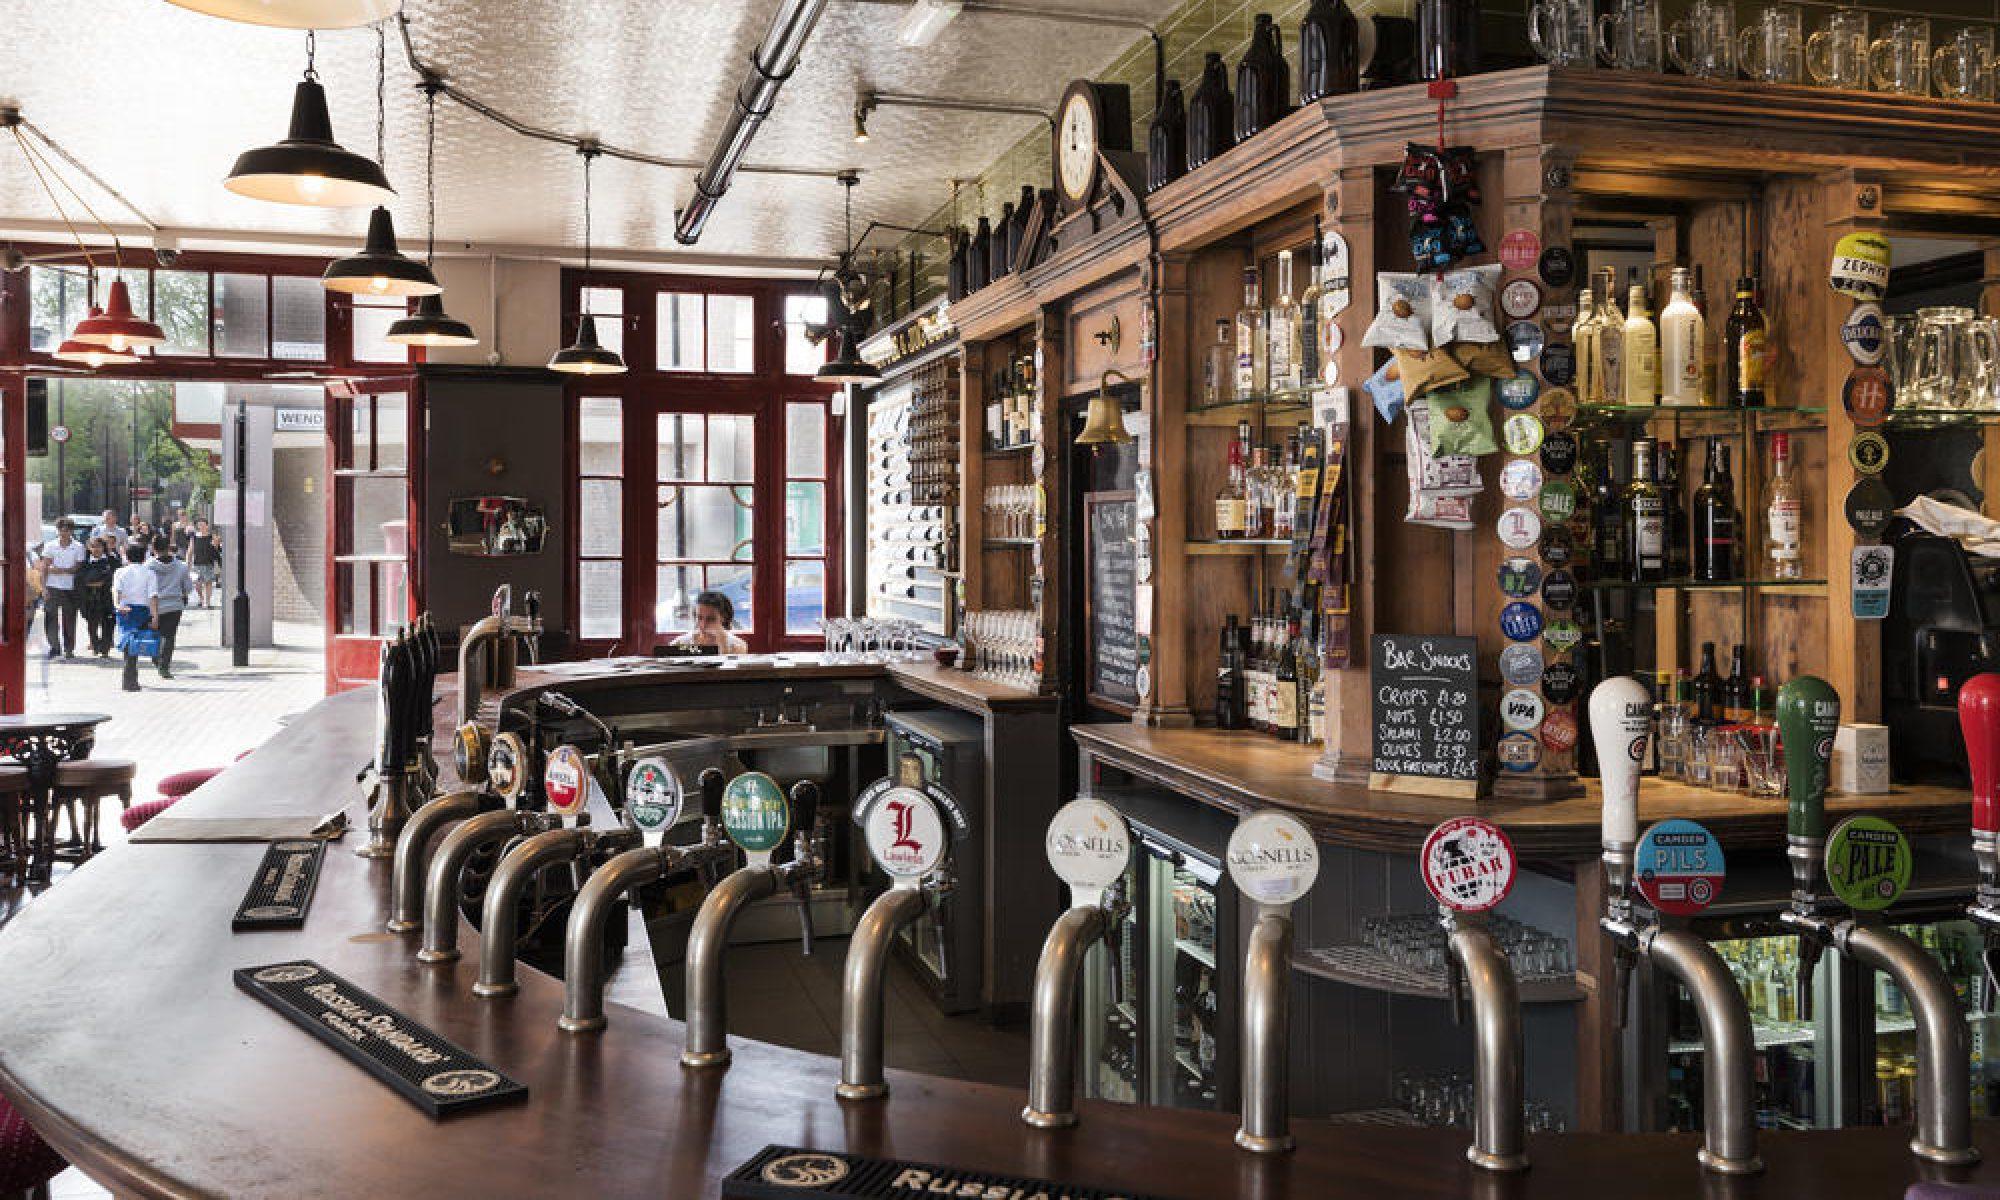 Partnership Pubs & Hospitality